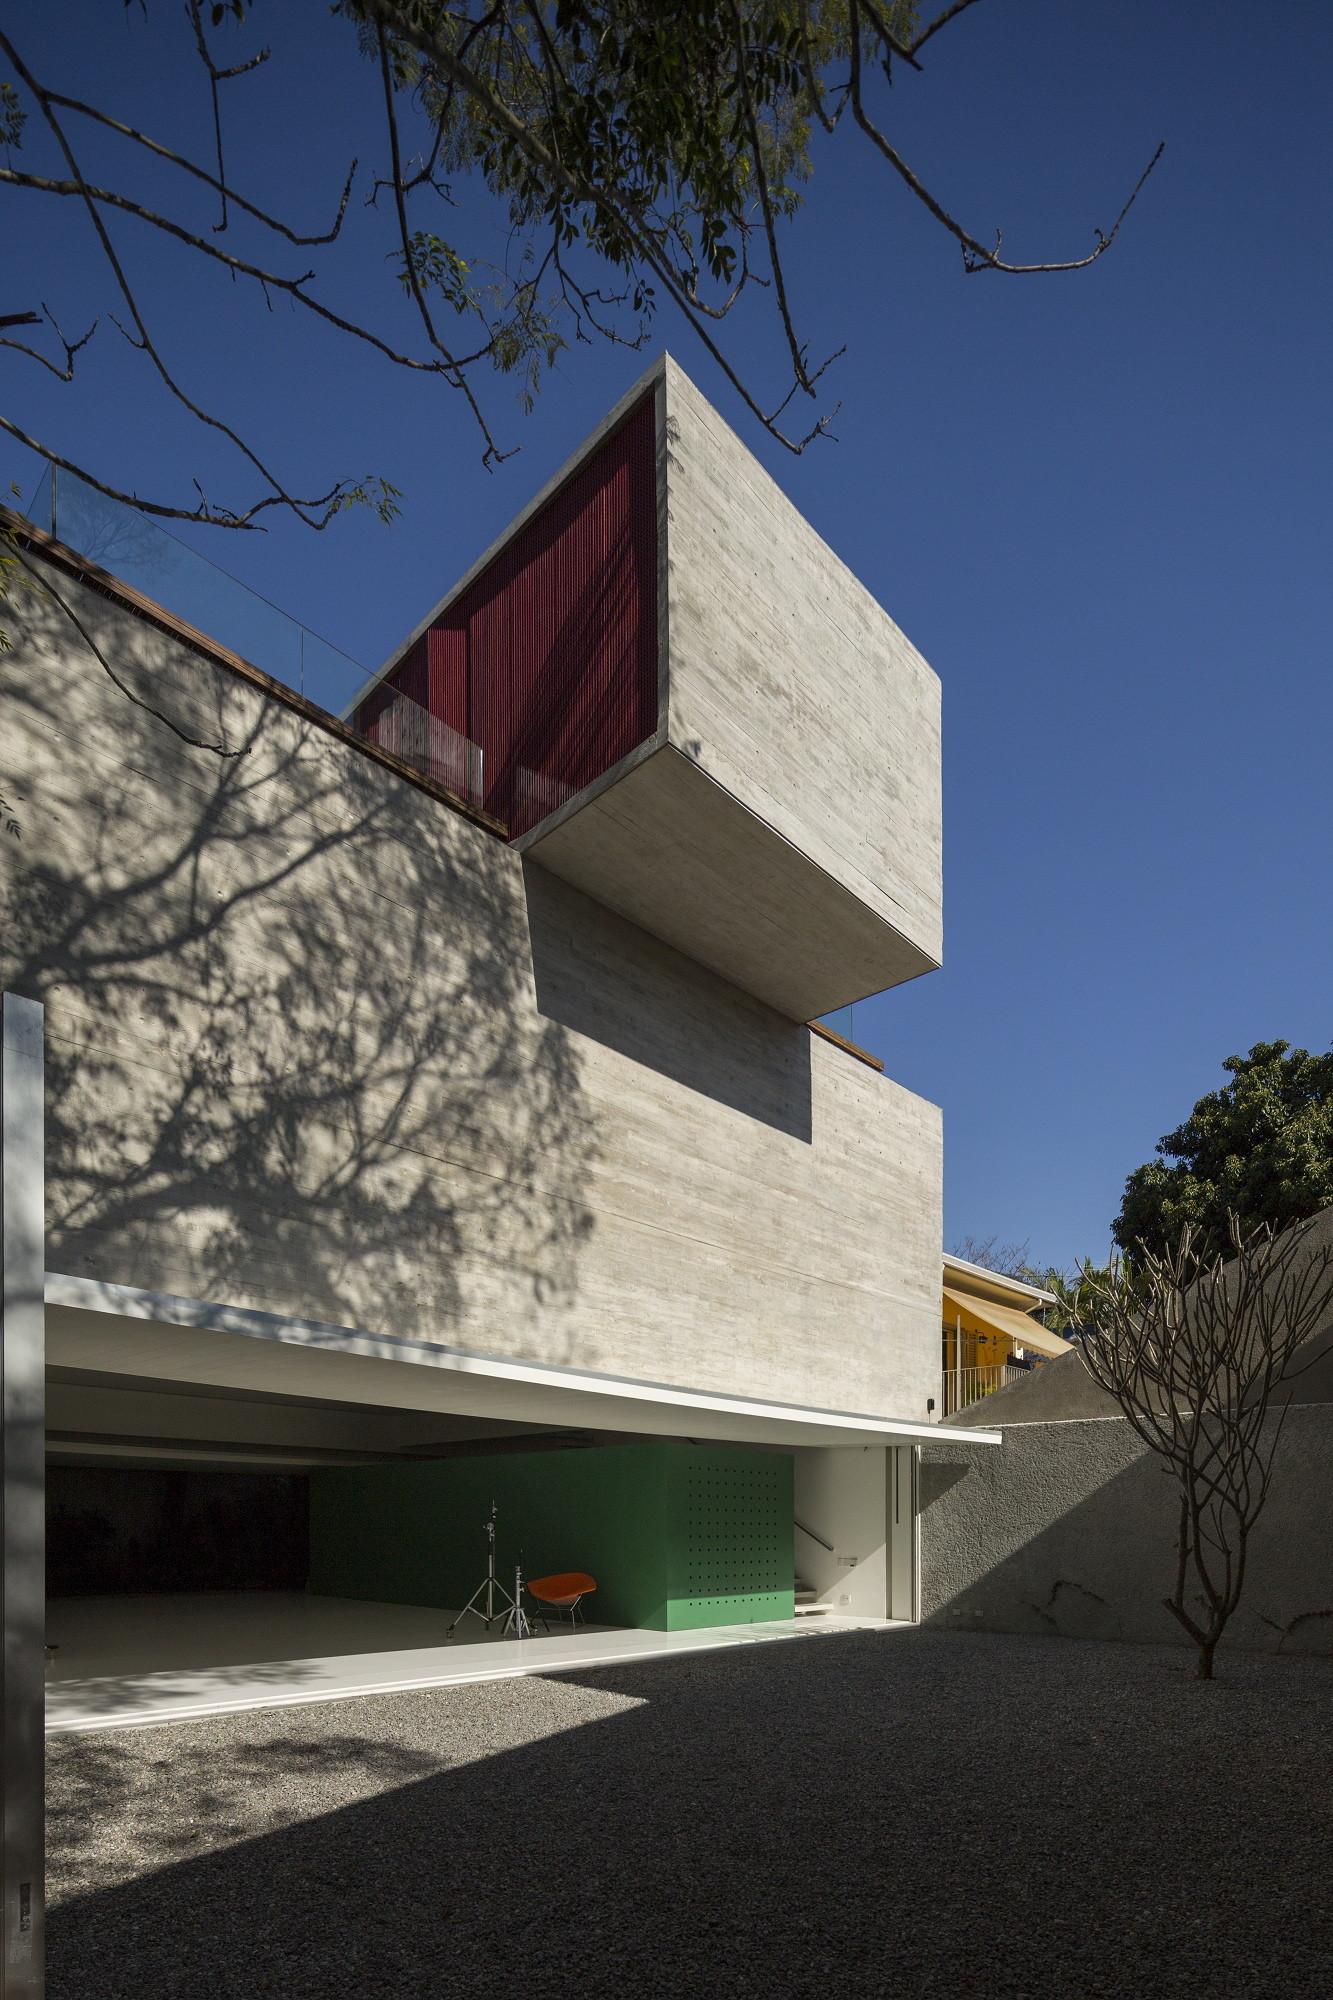 Studio R / Marcio Kogan, © Fernando Guerra | FG+SG